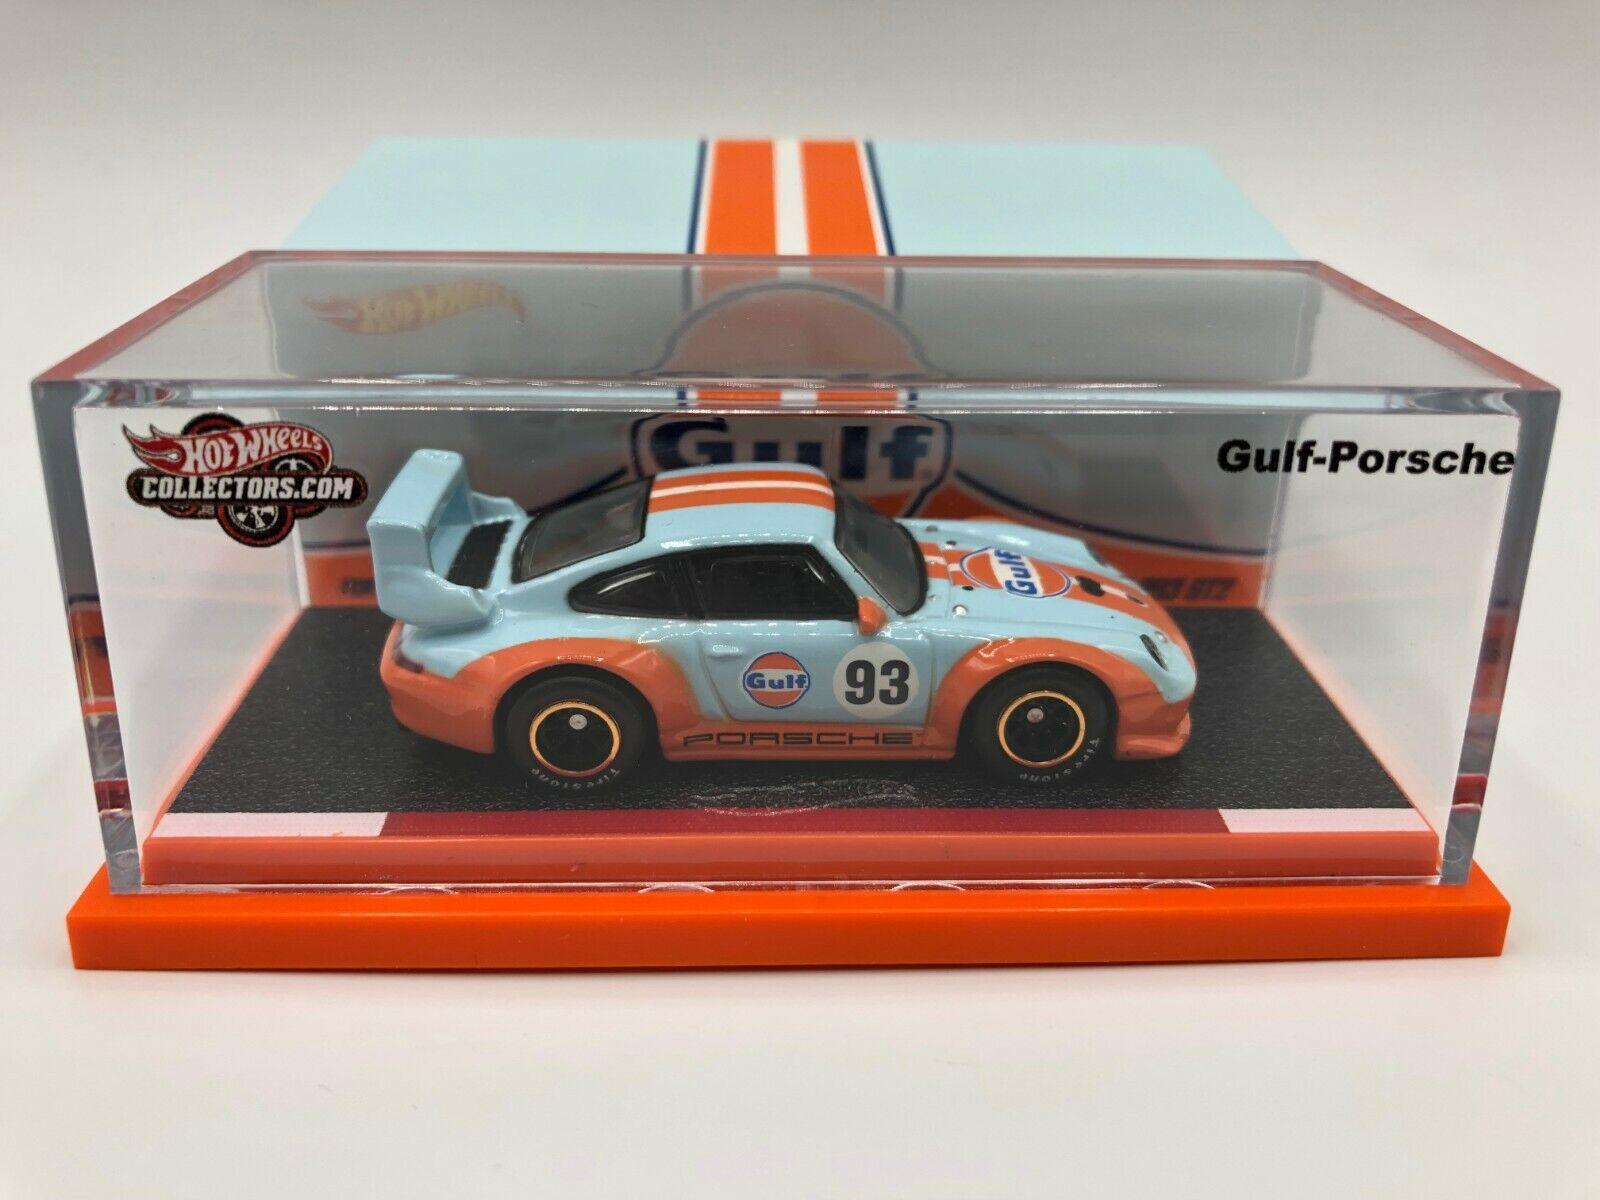 heta hjul Gulf -Porsche in Mint Condition In & Out Jag måste se Herregud